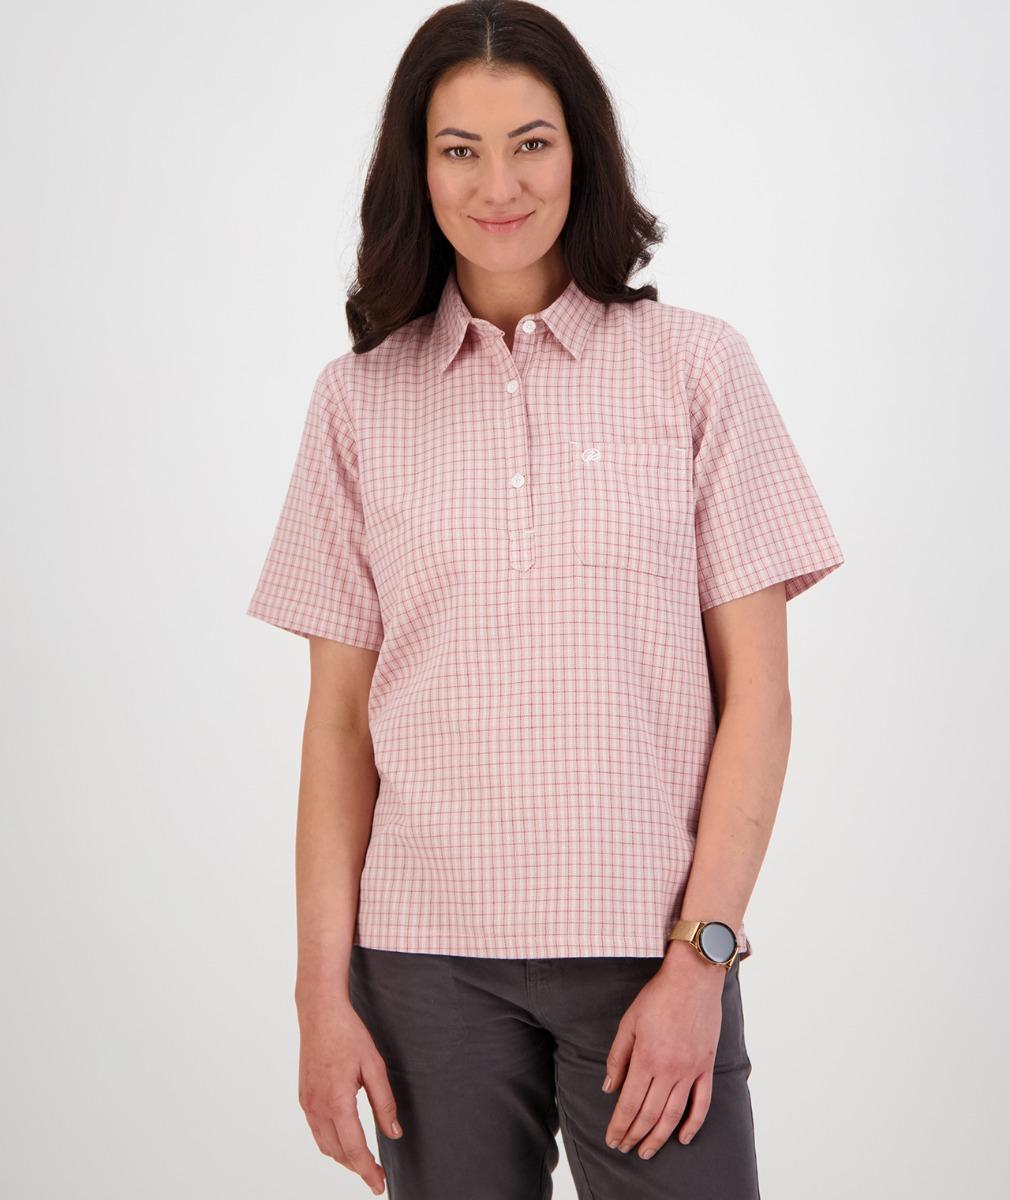 Swanndri Women's Tasman 100% Cotton Short Sleeve Shirt in Pink/Plum